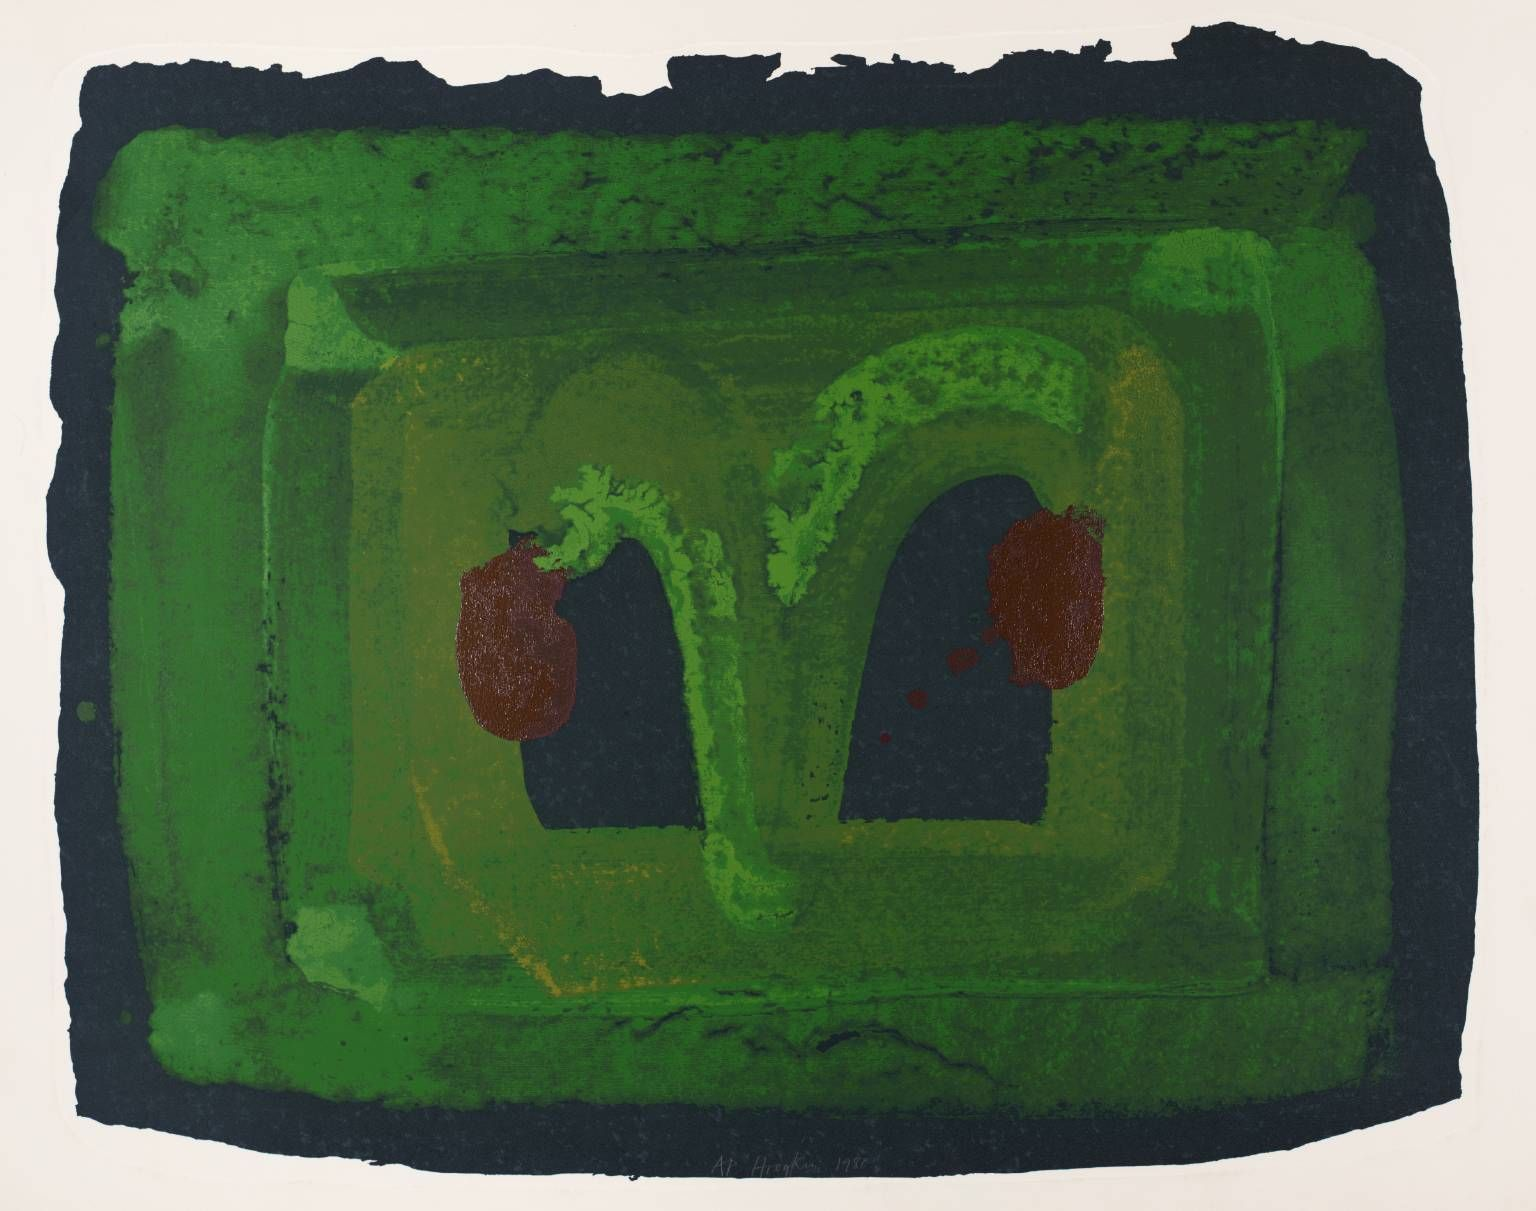 Howard Hodgkin 'Lotus', 1980 © Howard Hodgkin  Artist Howard Hodgkin born 1932 Title Lotus Date 1980 Medium Screenprint on paper Dimensions Image: 724 x 908 mm Collection Tate